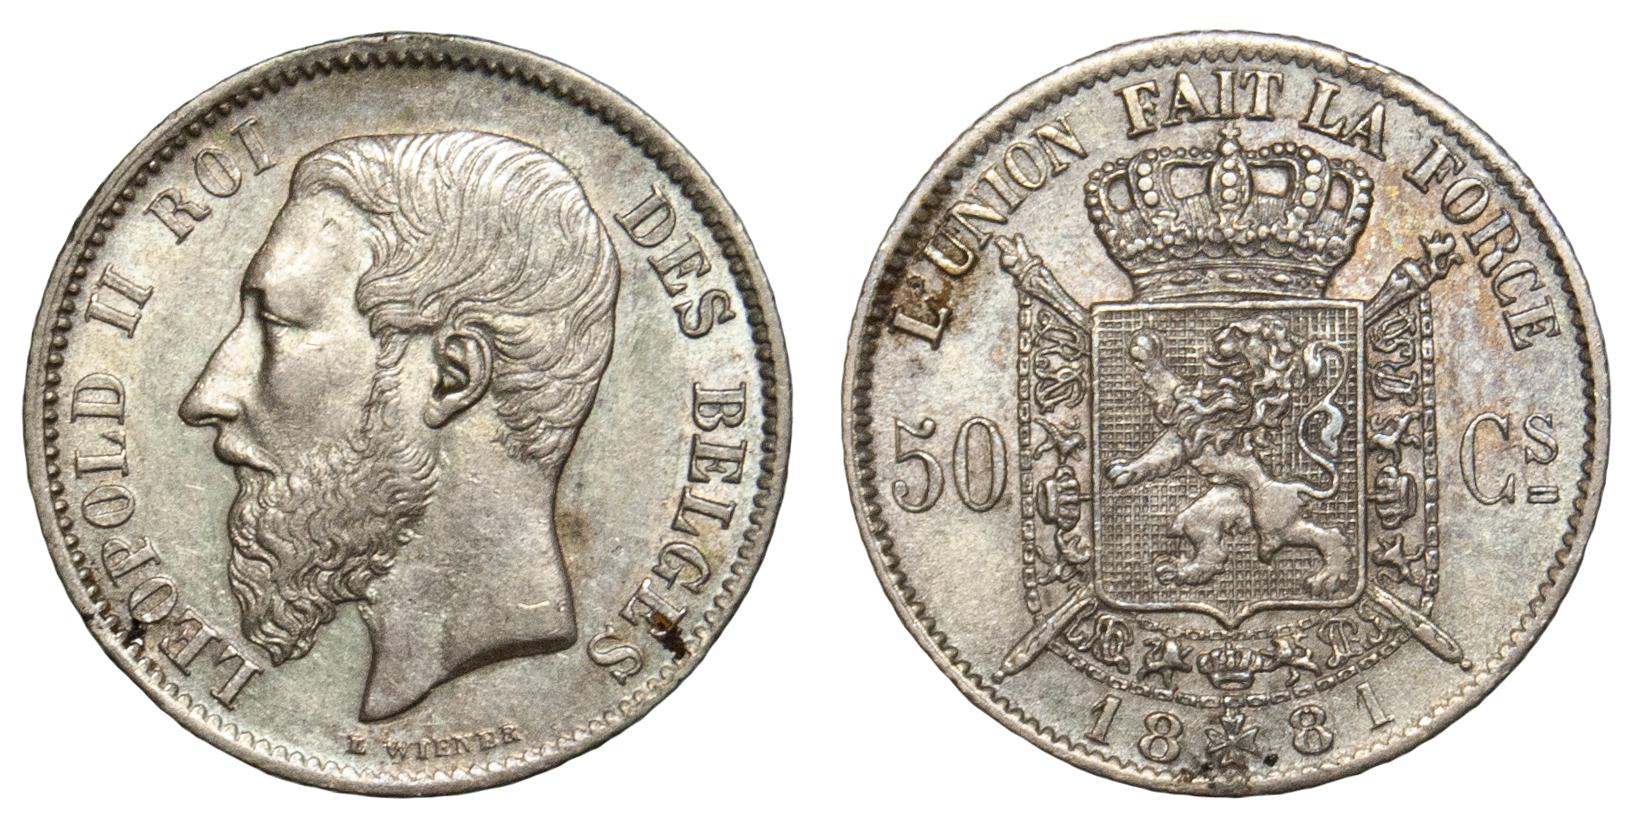 Belgium, Leopold II, 50 centimes, 1881